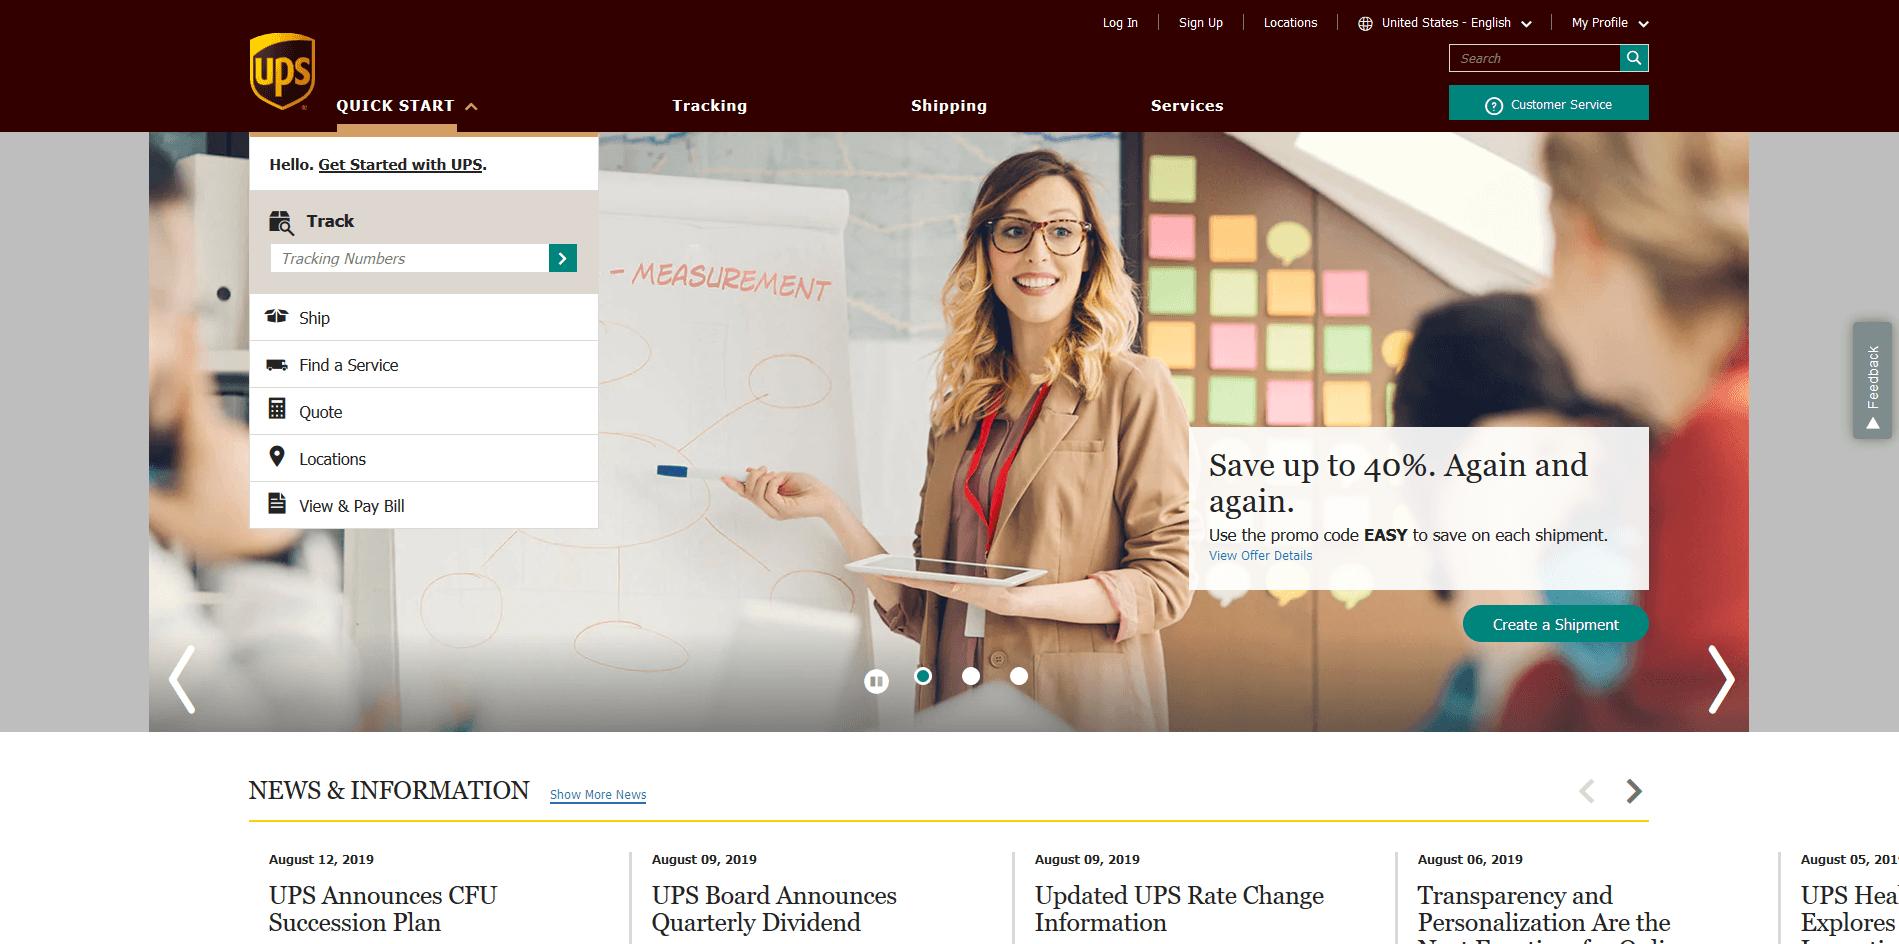 UPS website's picture